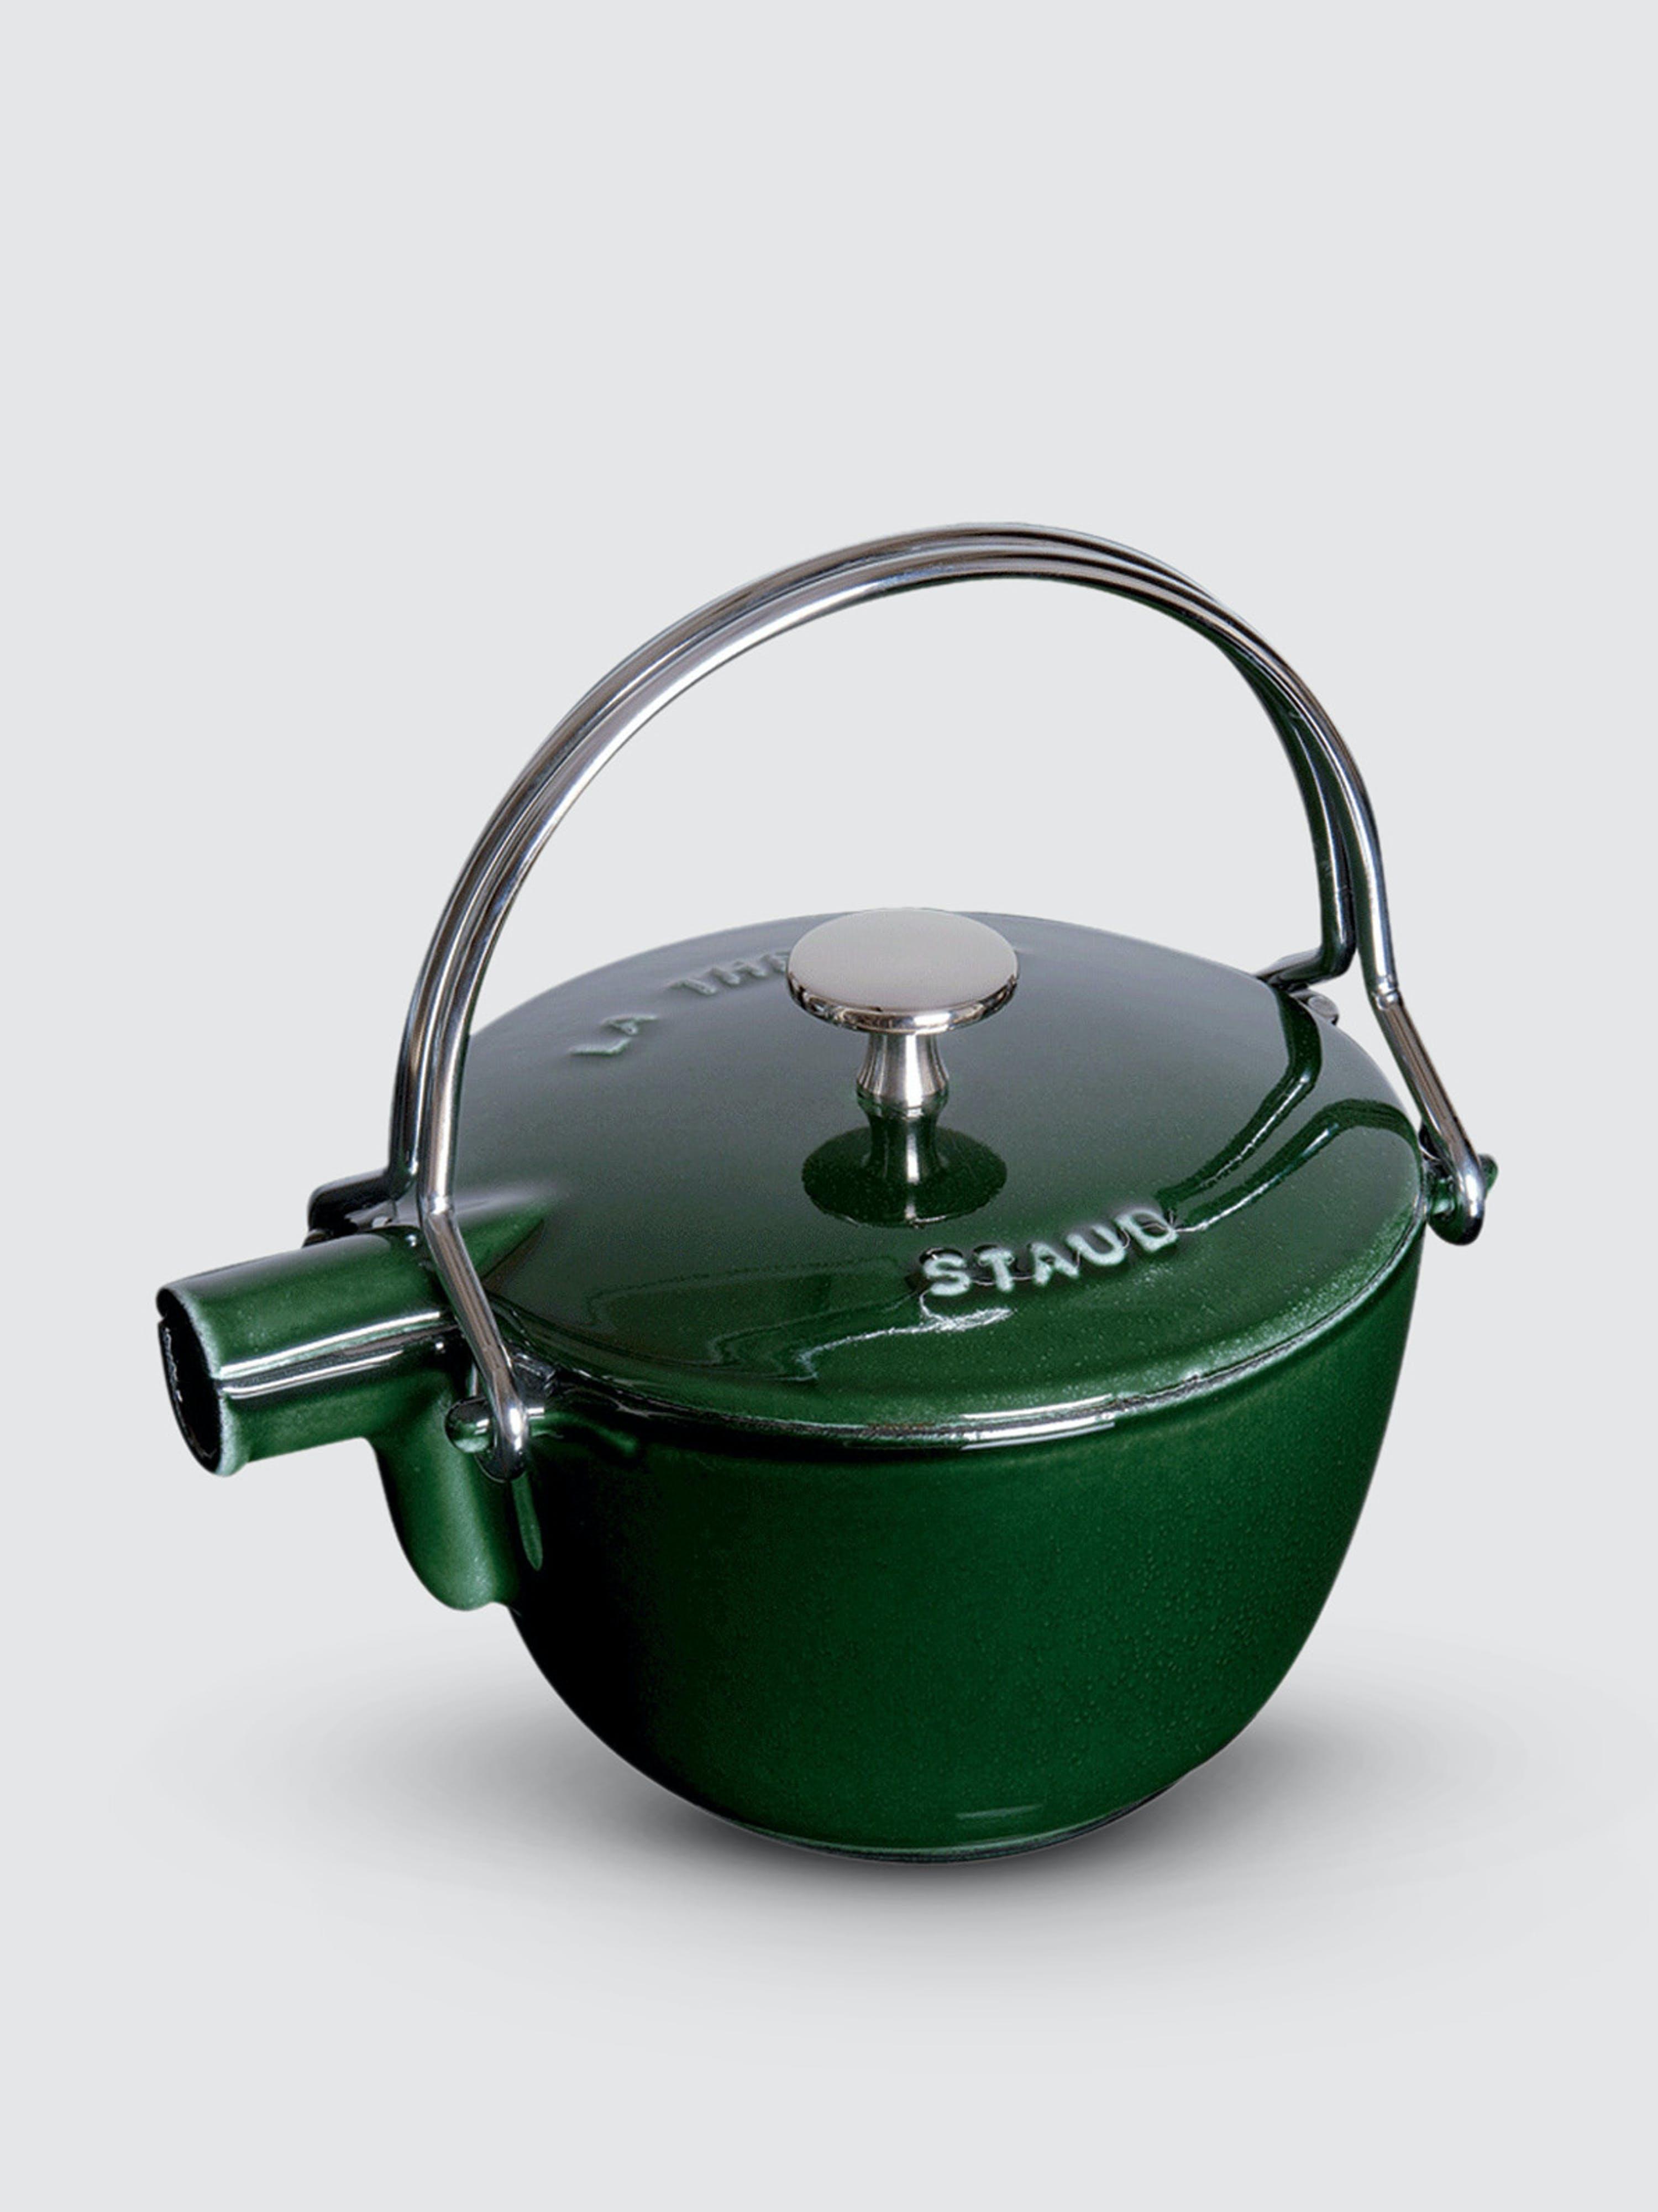 Staub - Verified Partner 1-Qt Round Tea Kettle  - Green